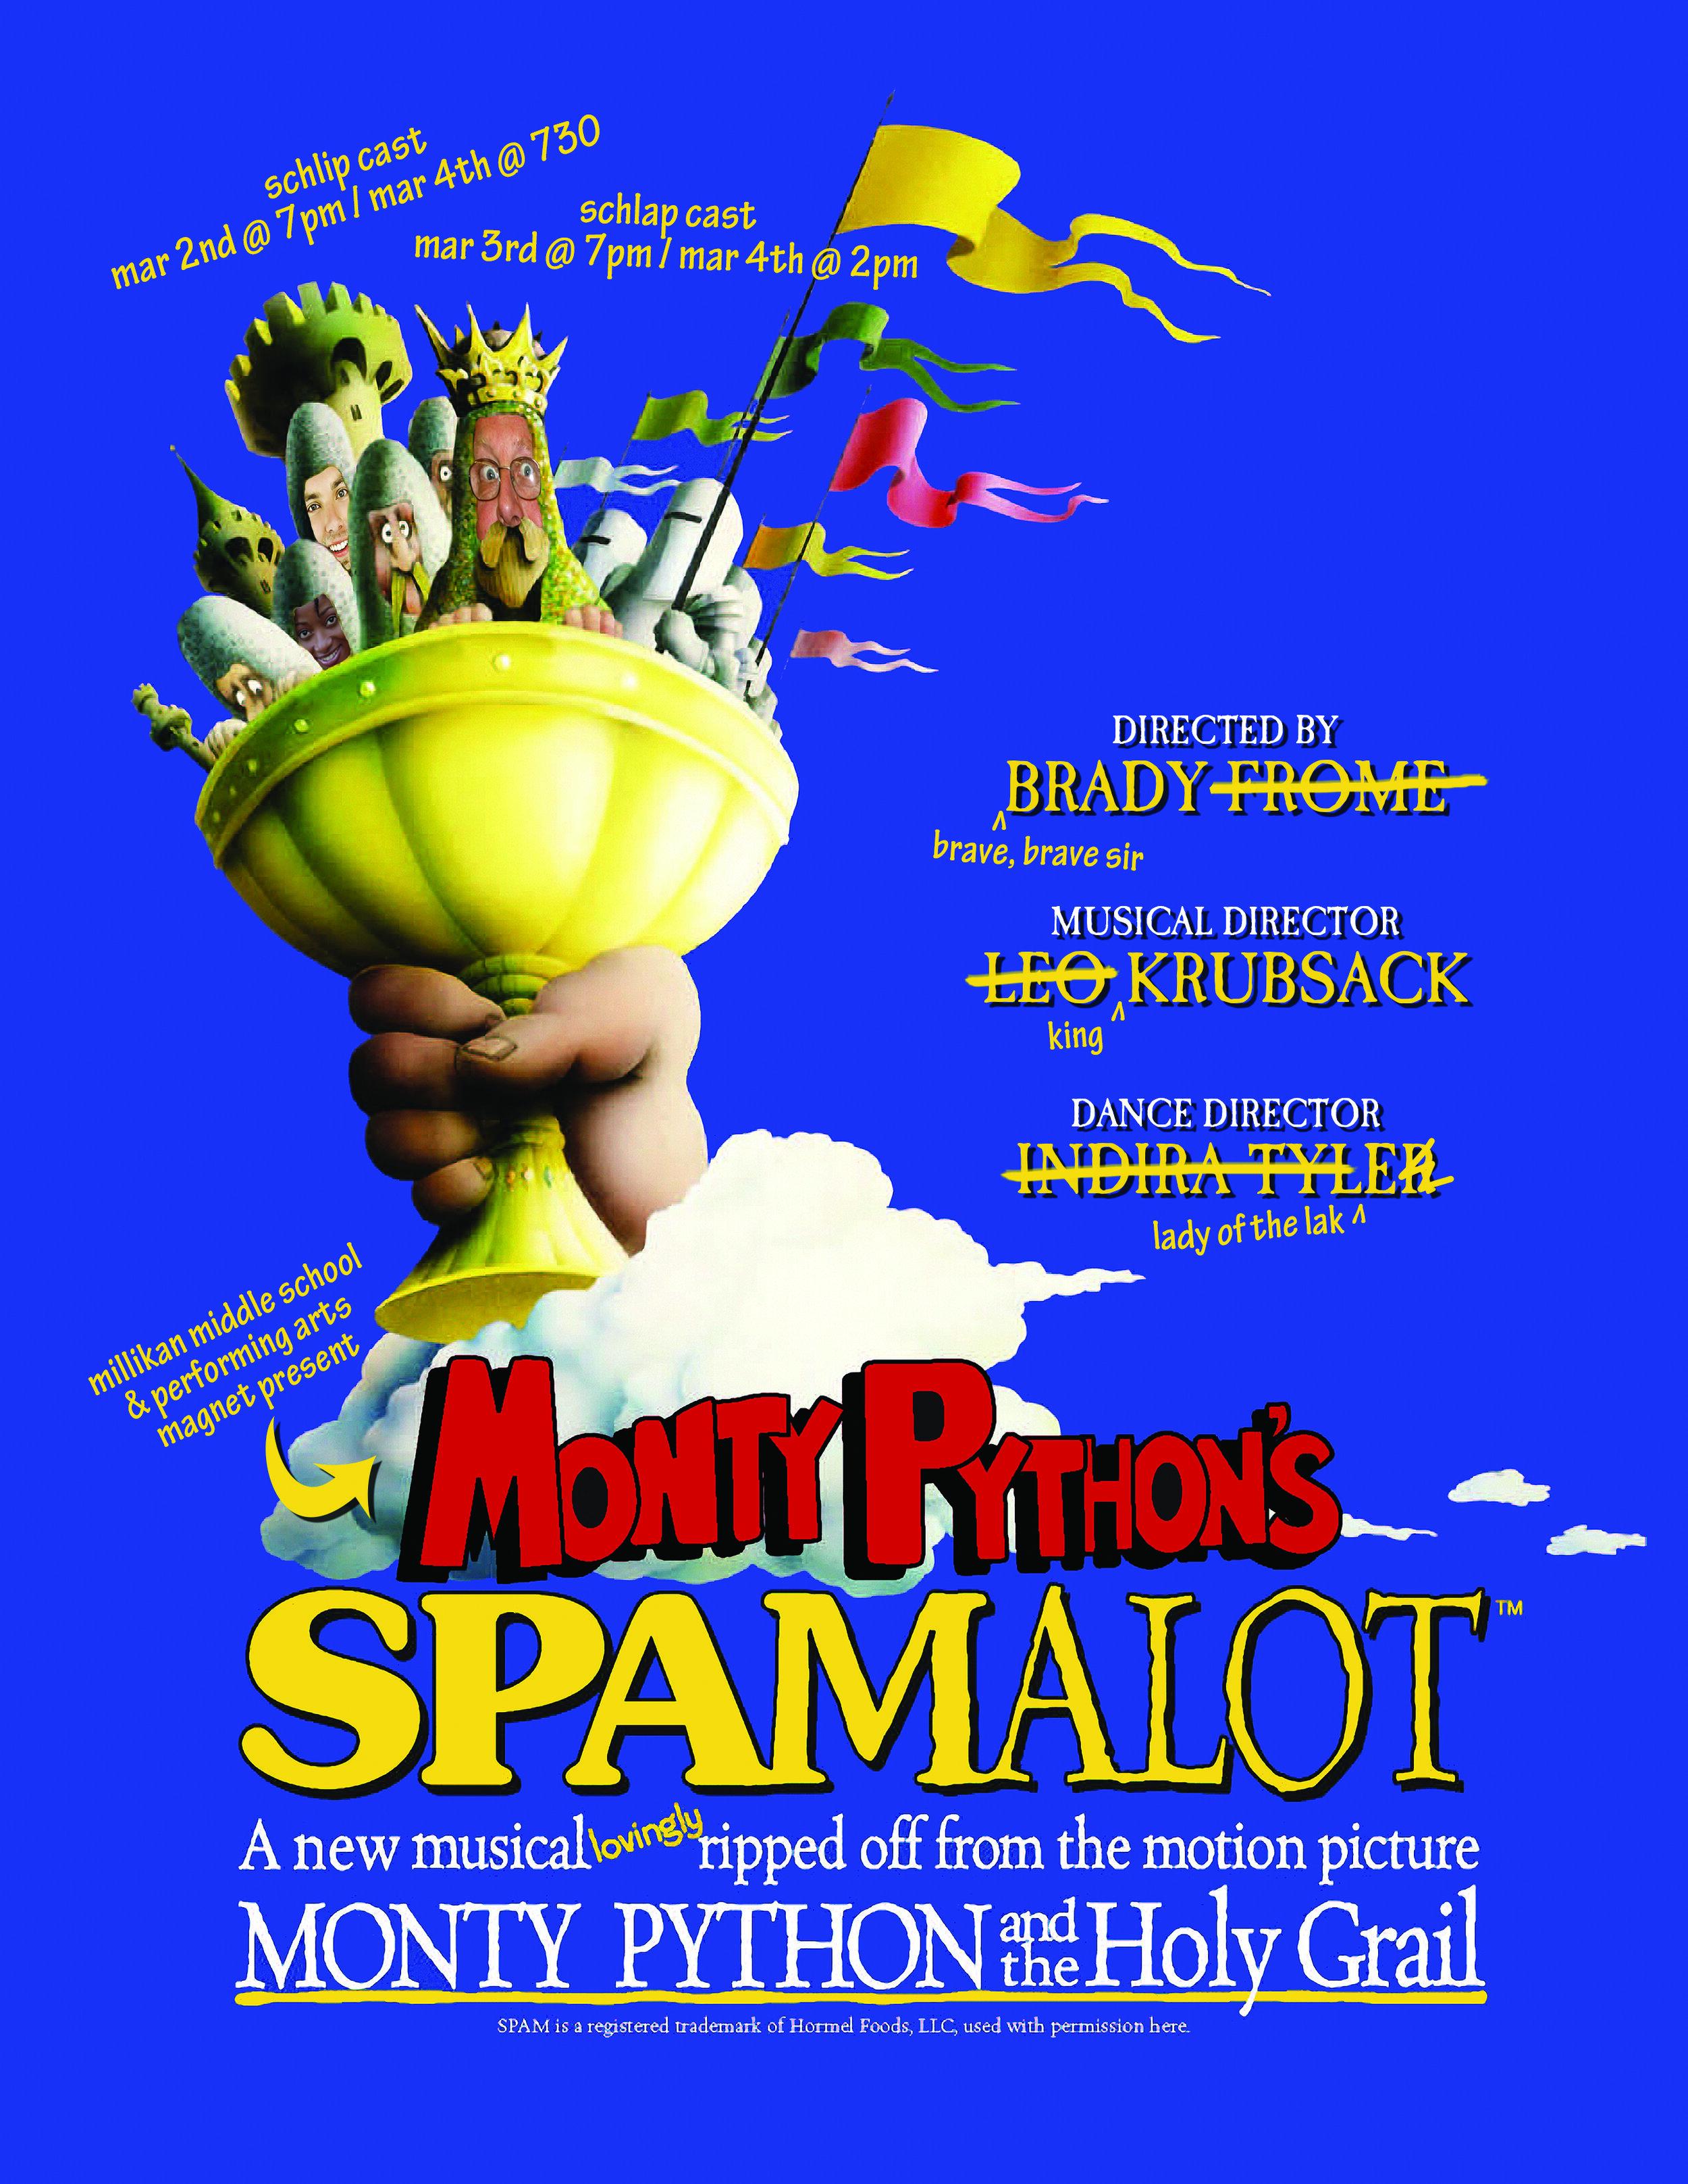 Spamalot 8.5x11 copy.jpg